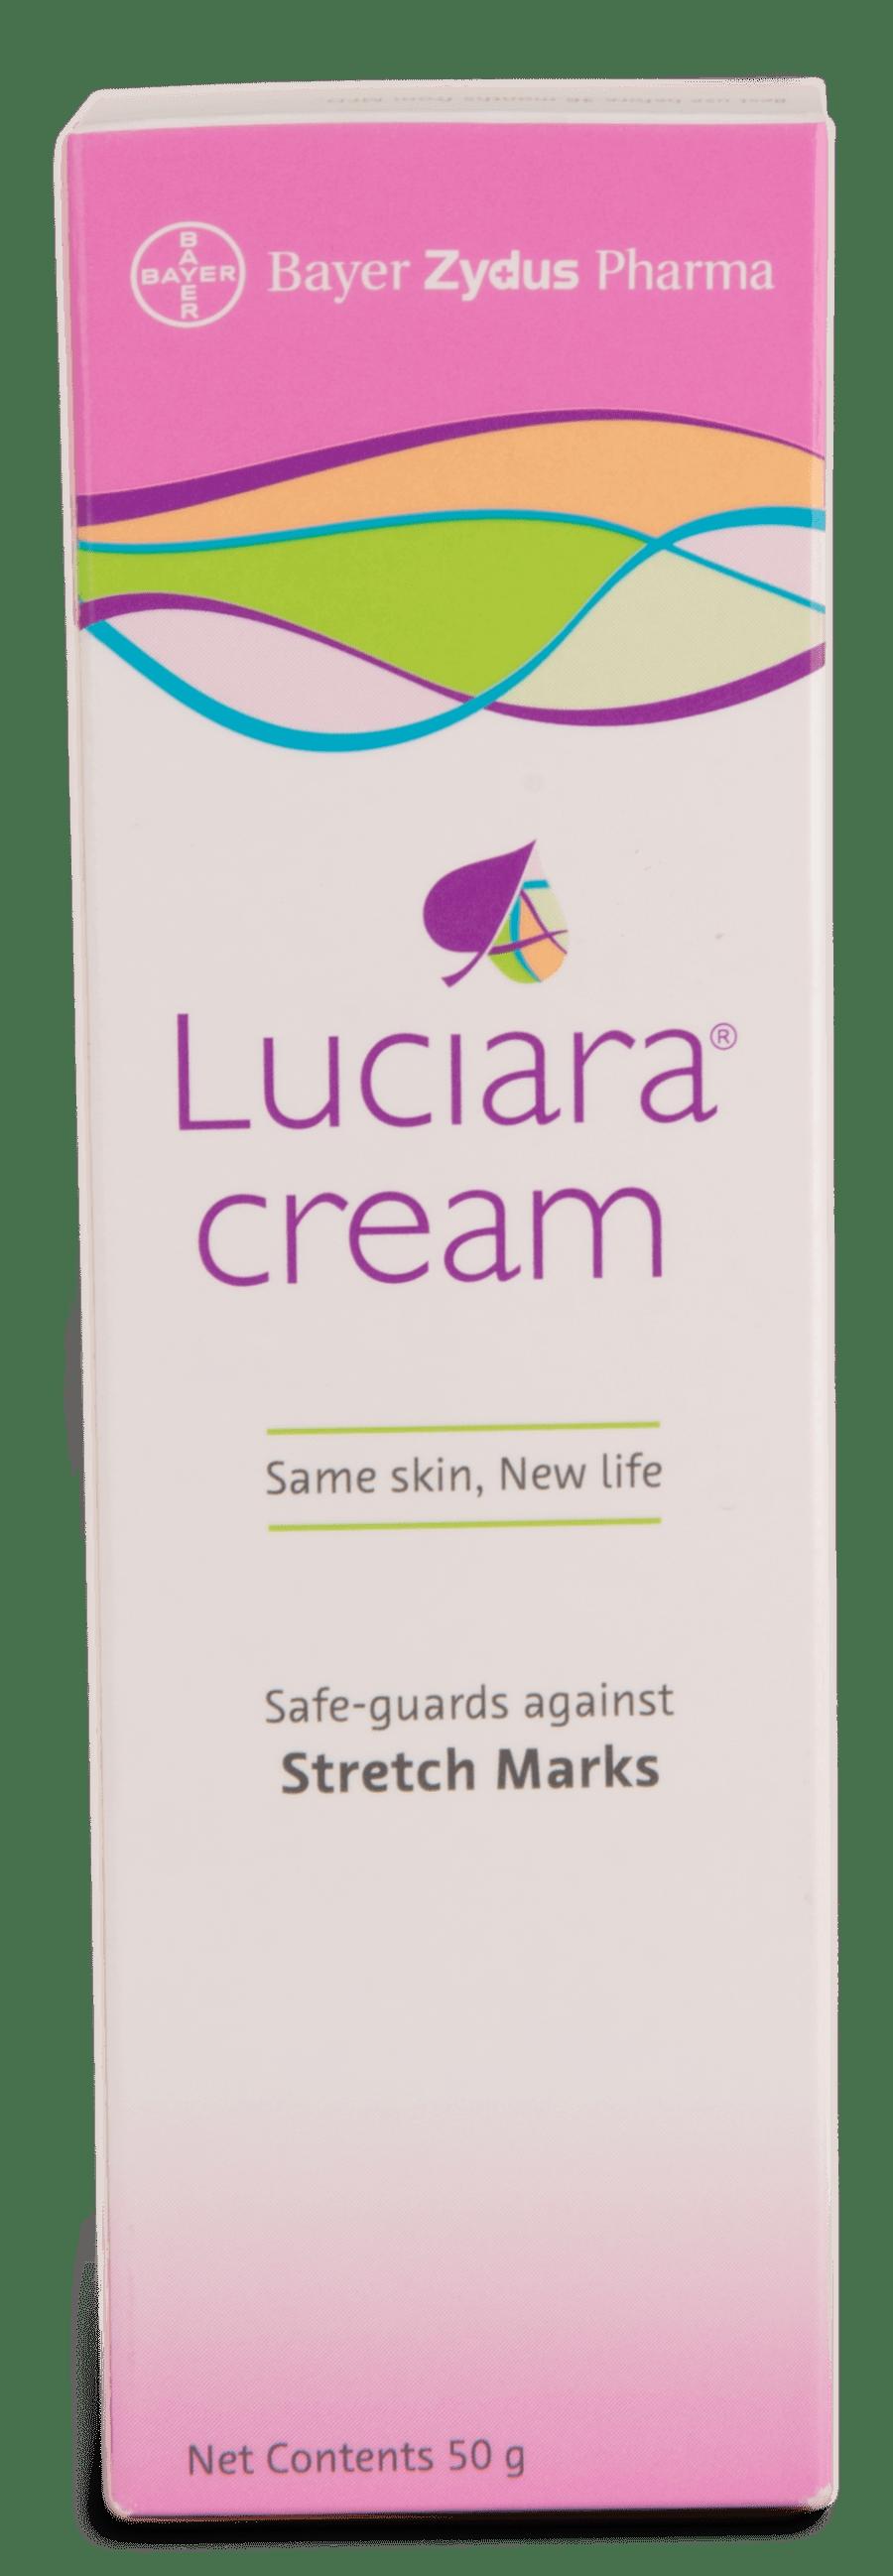 Luciara Cream - 50gm